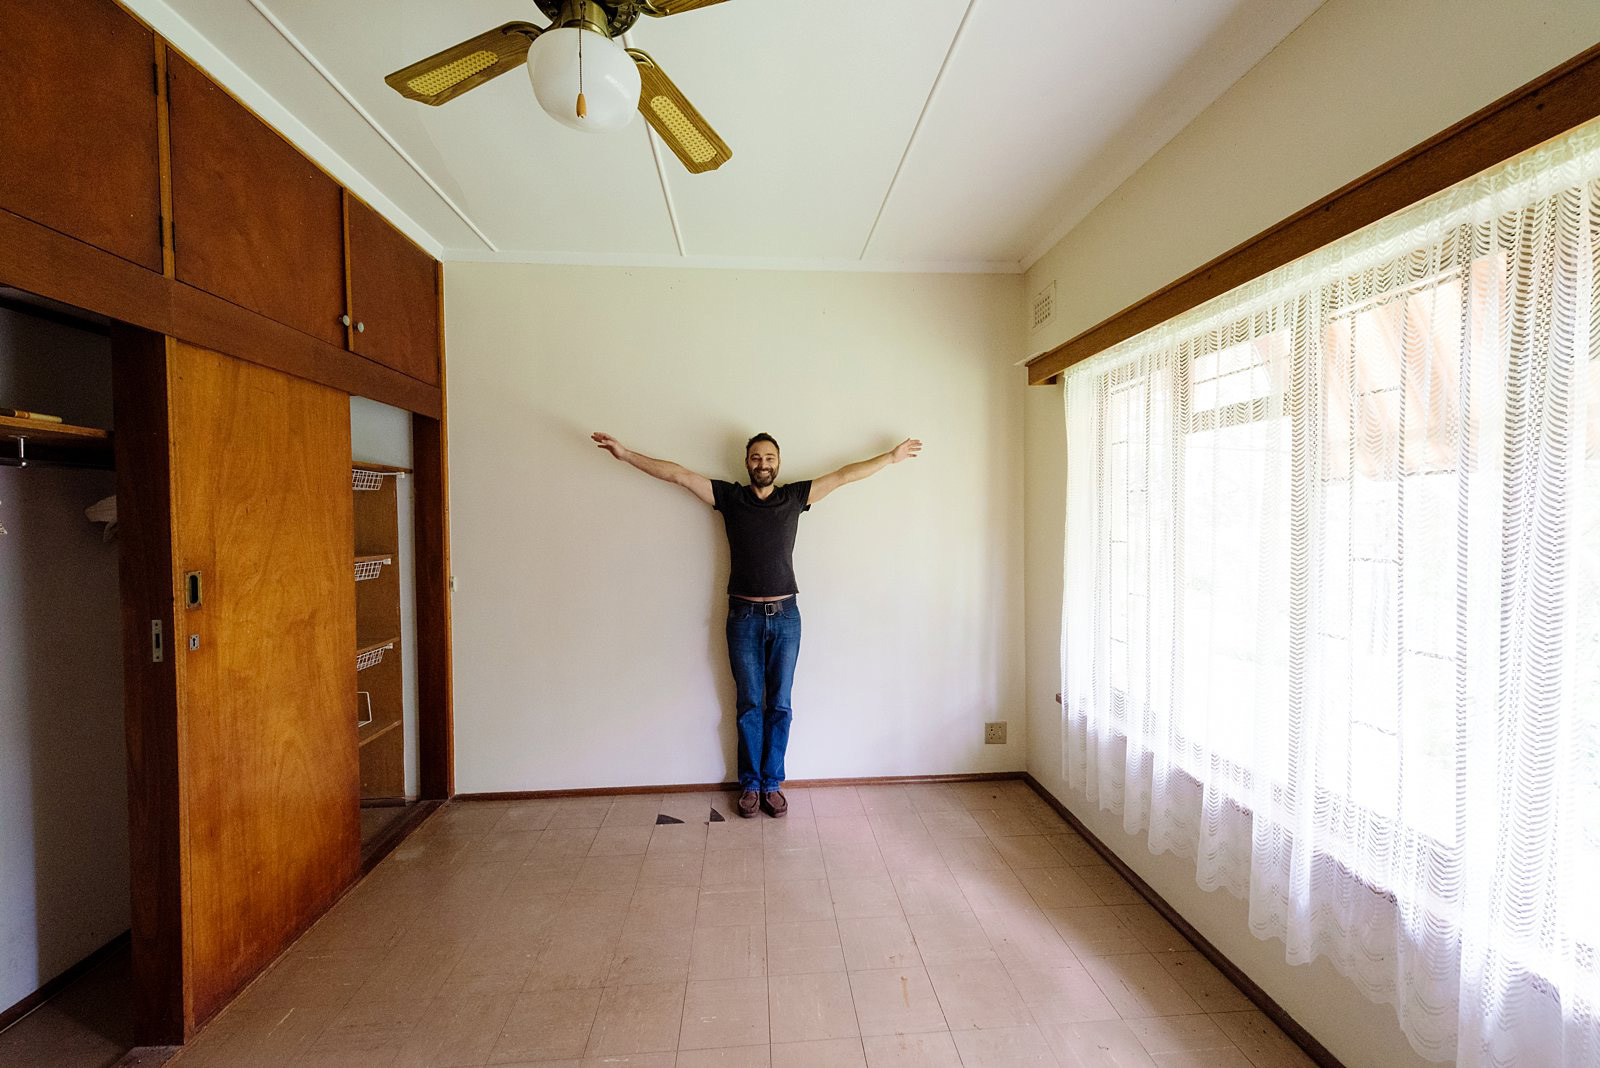 mouse-house-demolition-home-renovation-007-7078